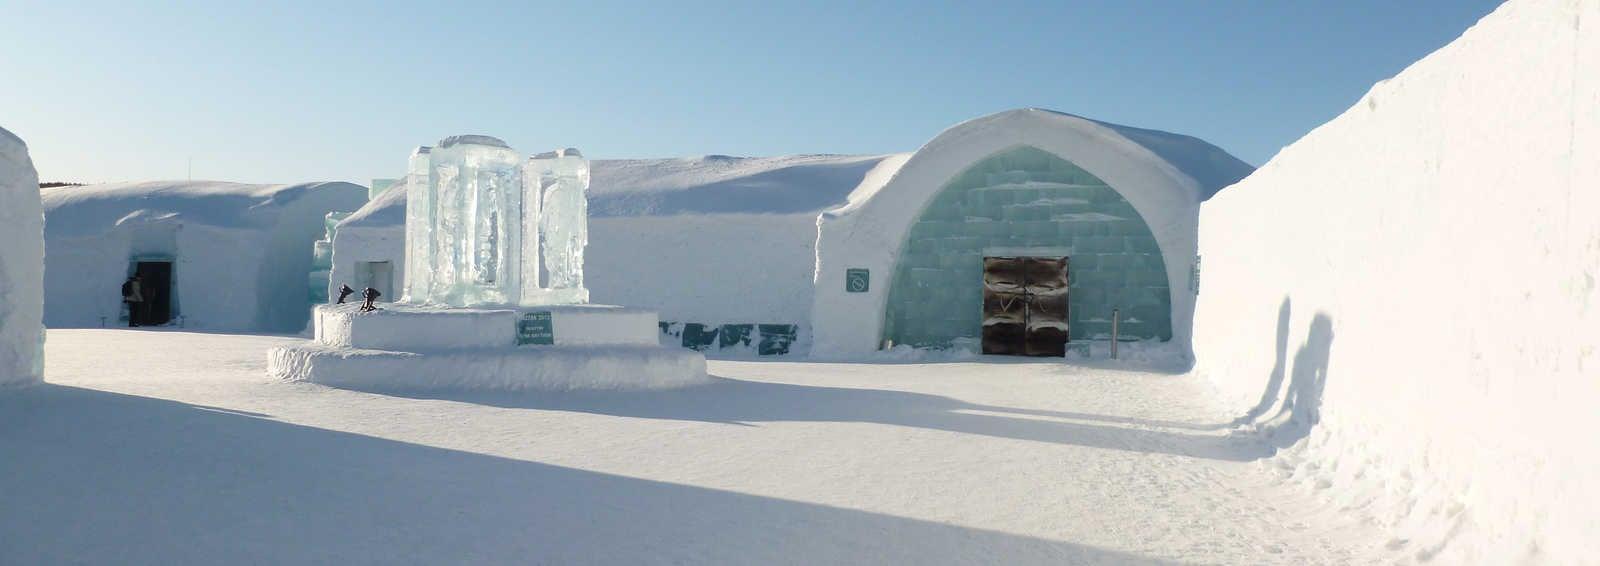 Icehotel entrance, Jukkasjarvi, Swedish Lapland